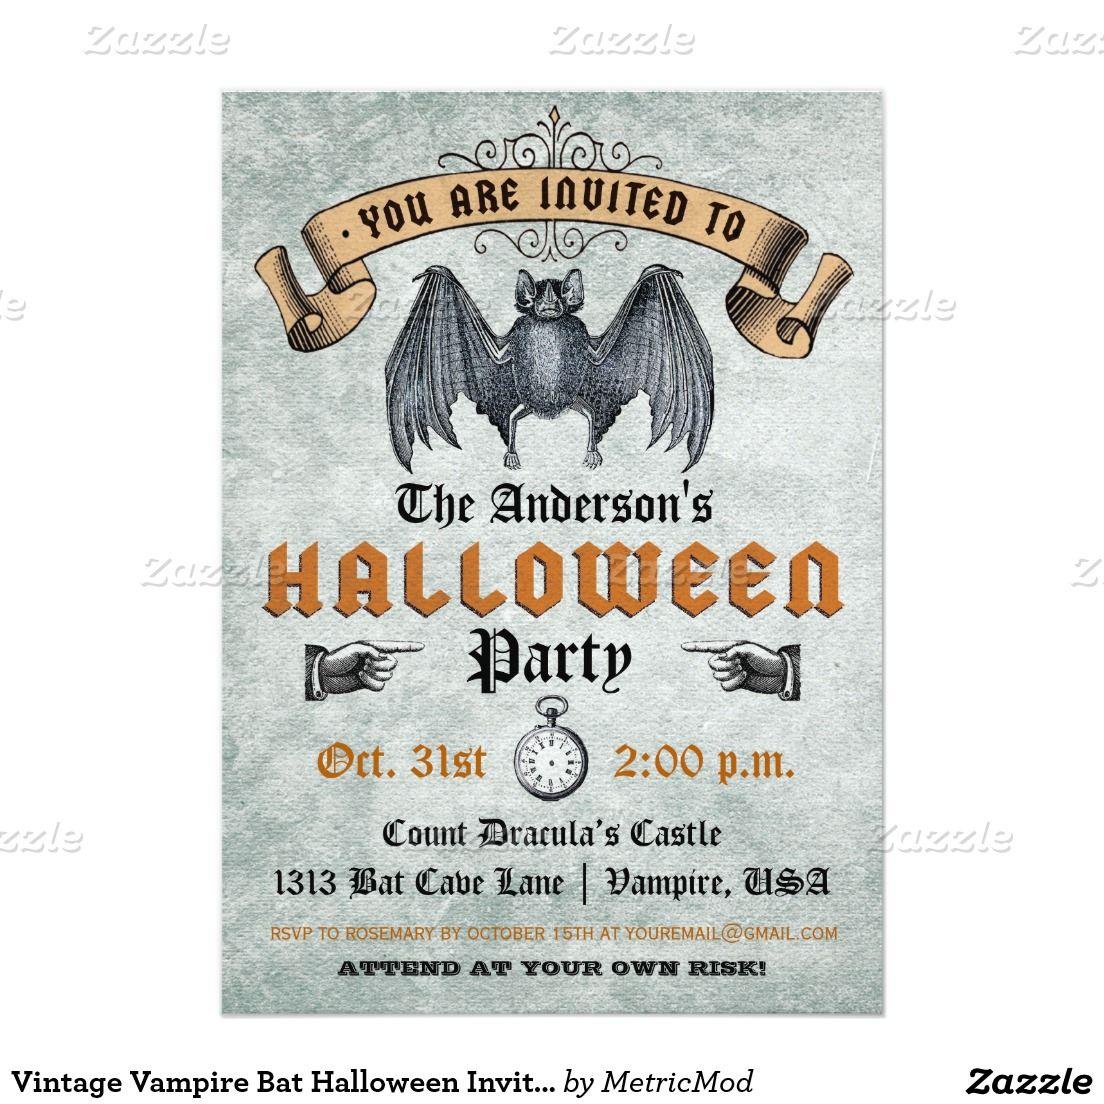 Vintage vampire bat halloween invitation halloween invitations vintage vampire bat halloween invitation stopboris Images